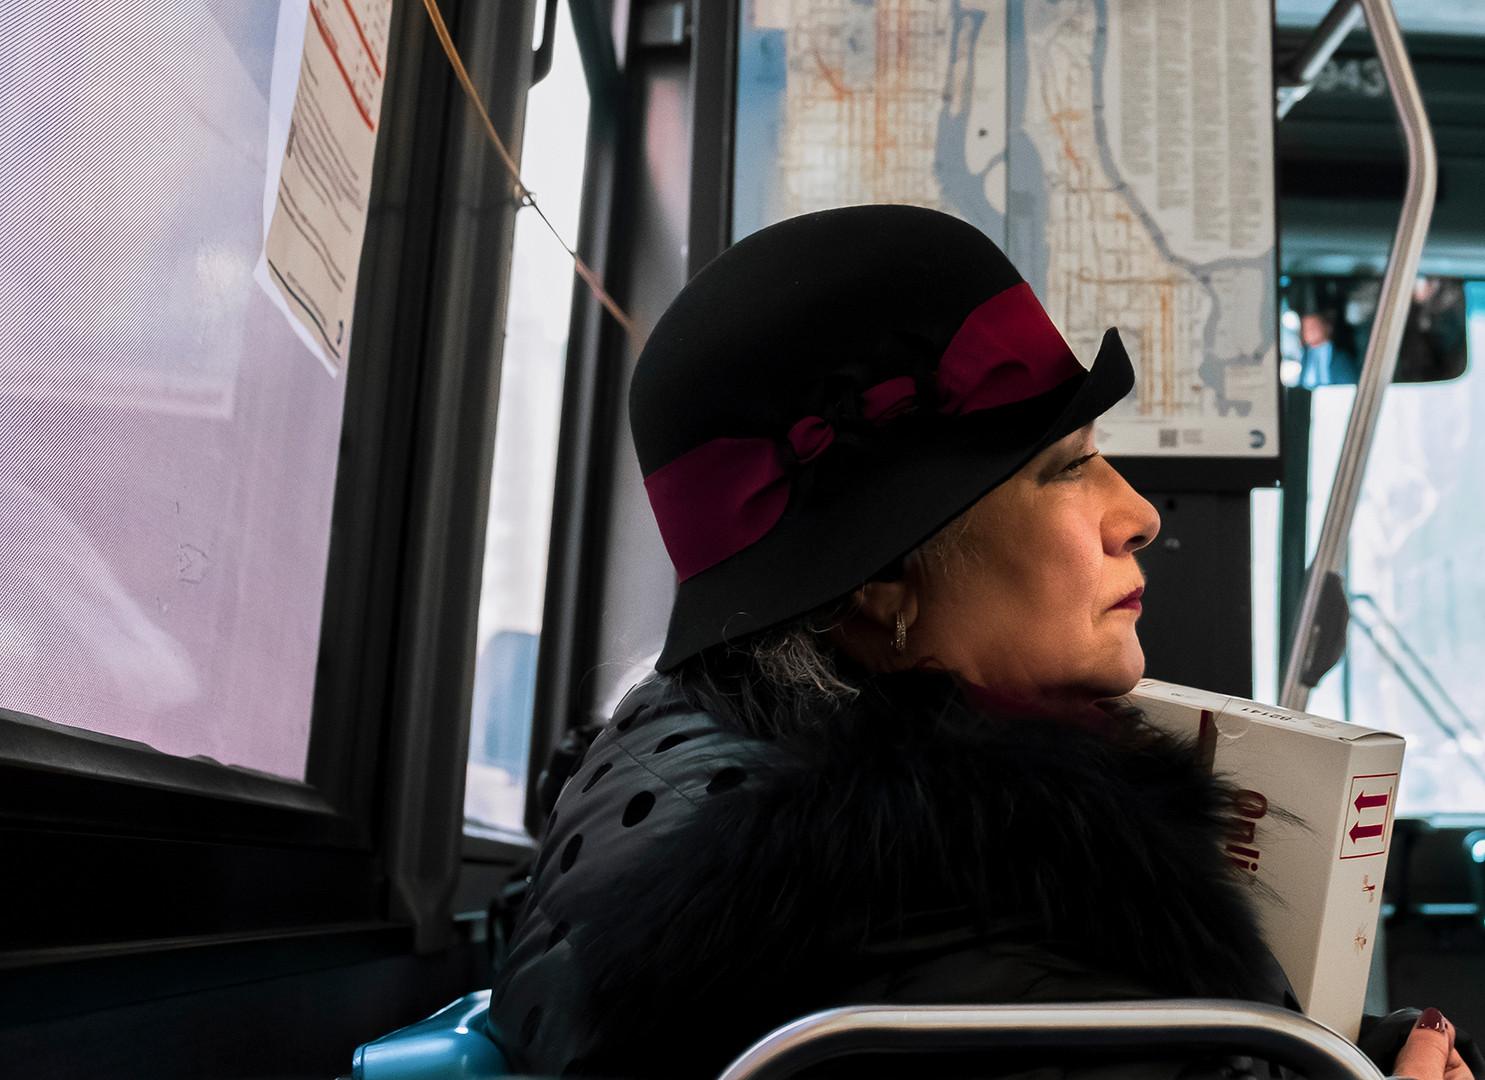 Hat lady on bus.jpg